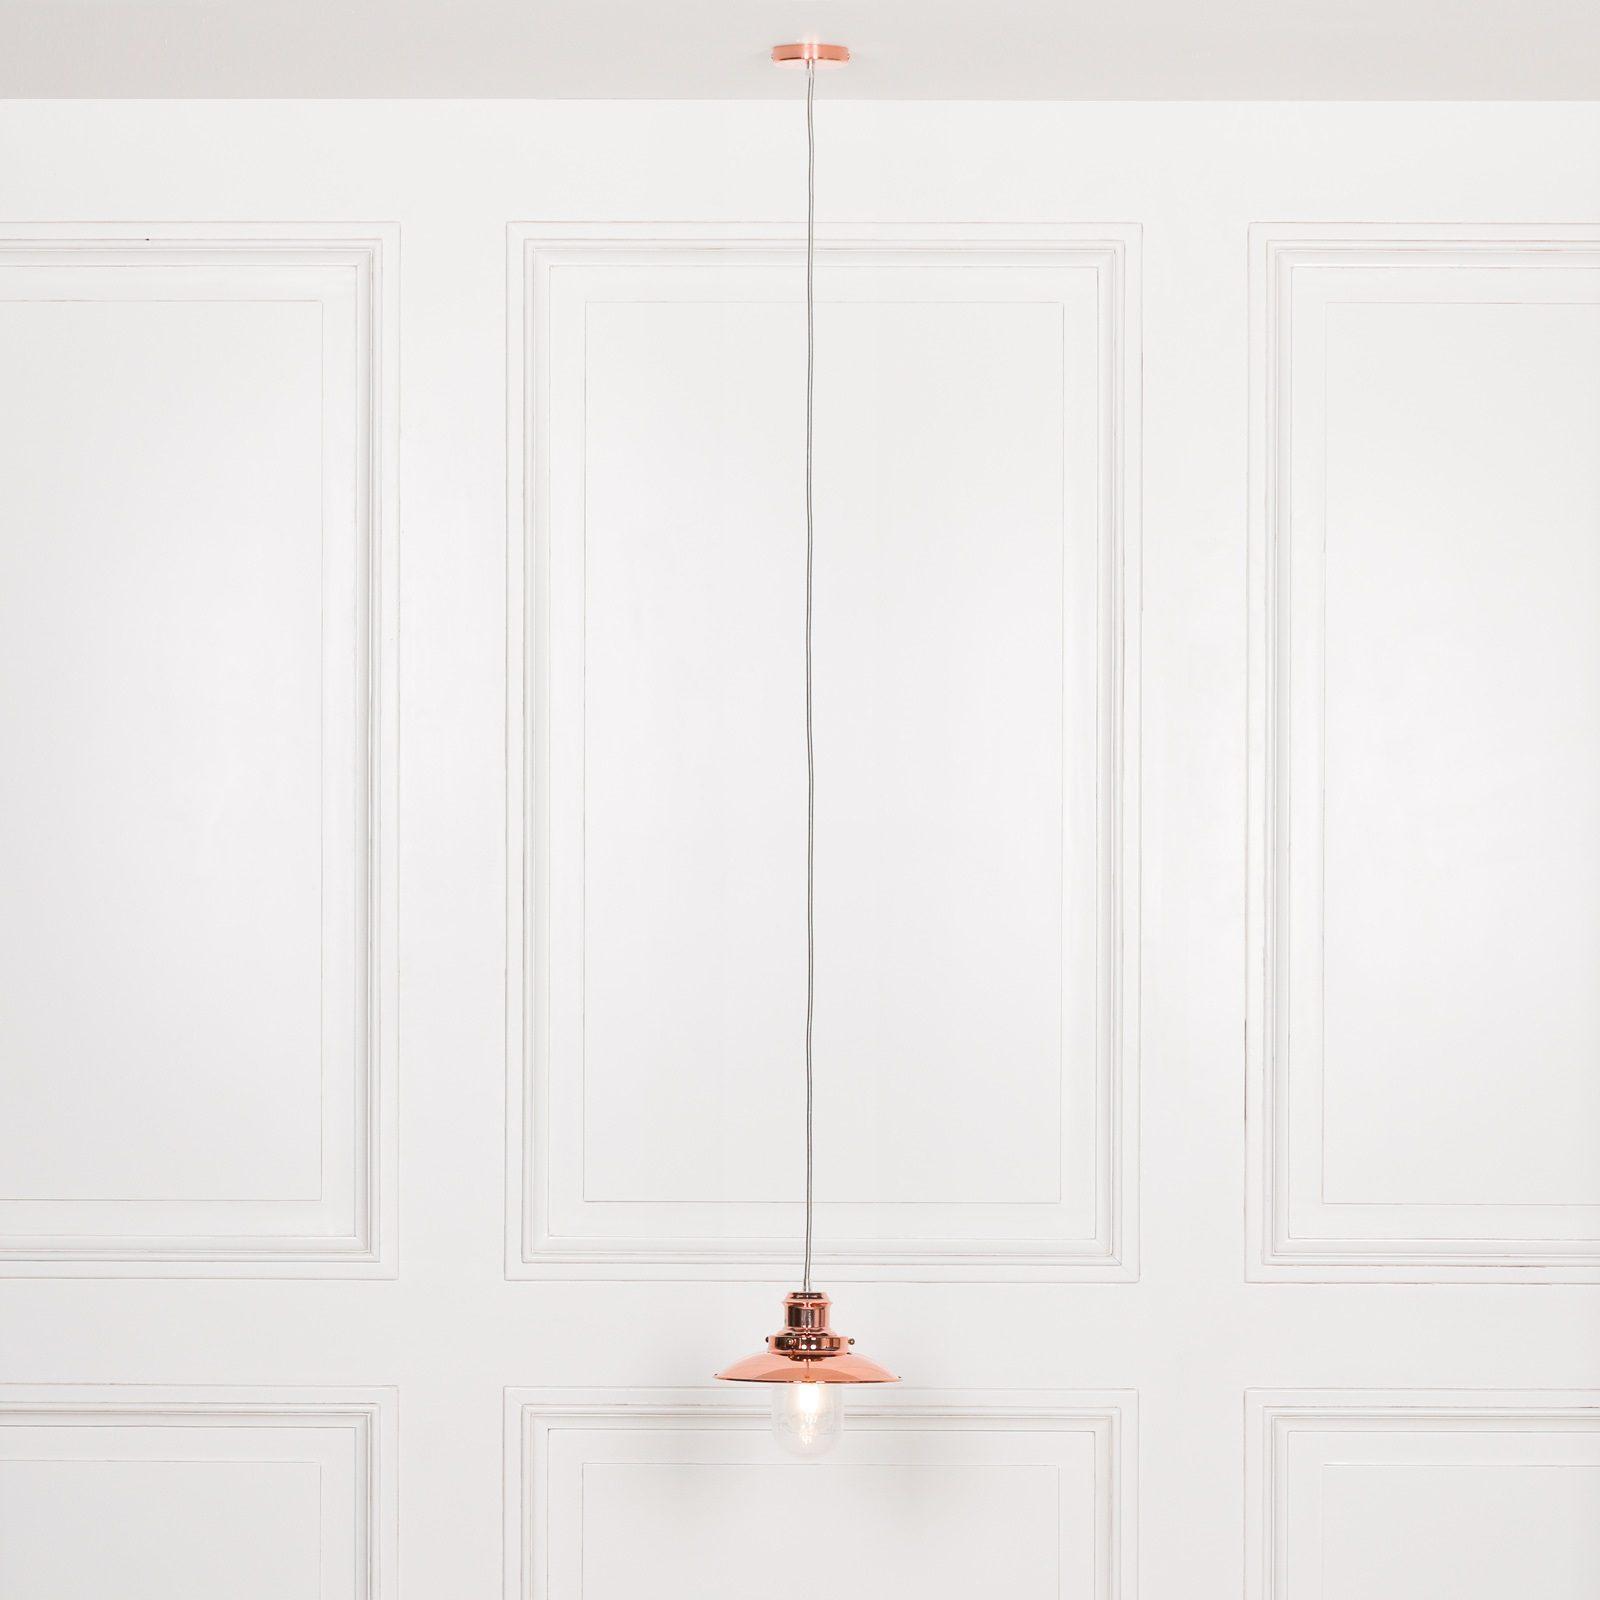 Copper Style Fishermans Light